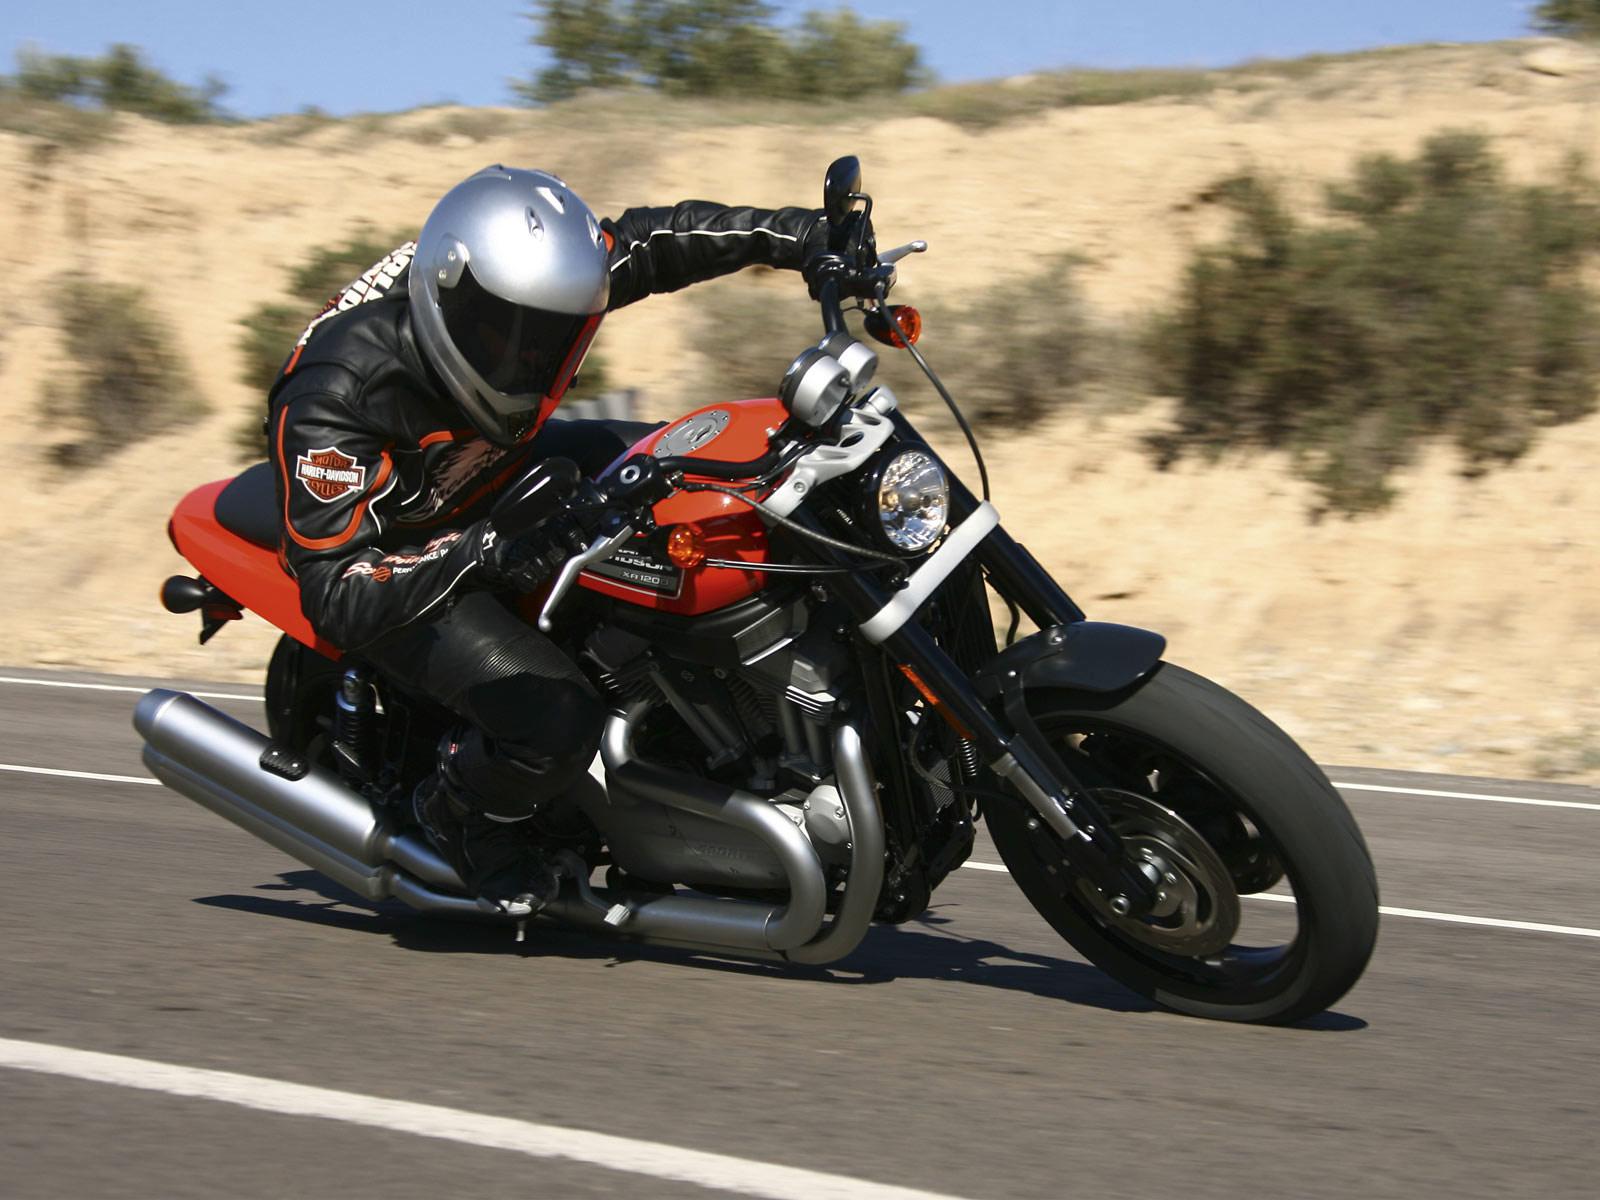 Мотоцикл Харлей -Дэвидсон 2 (P020)